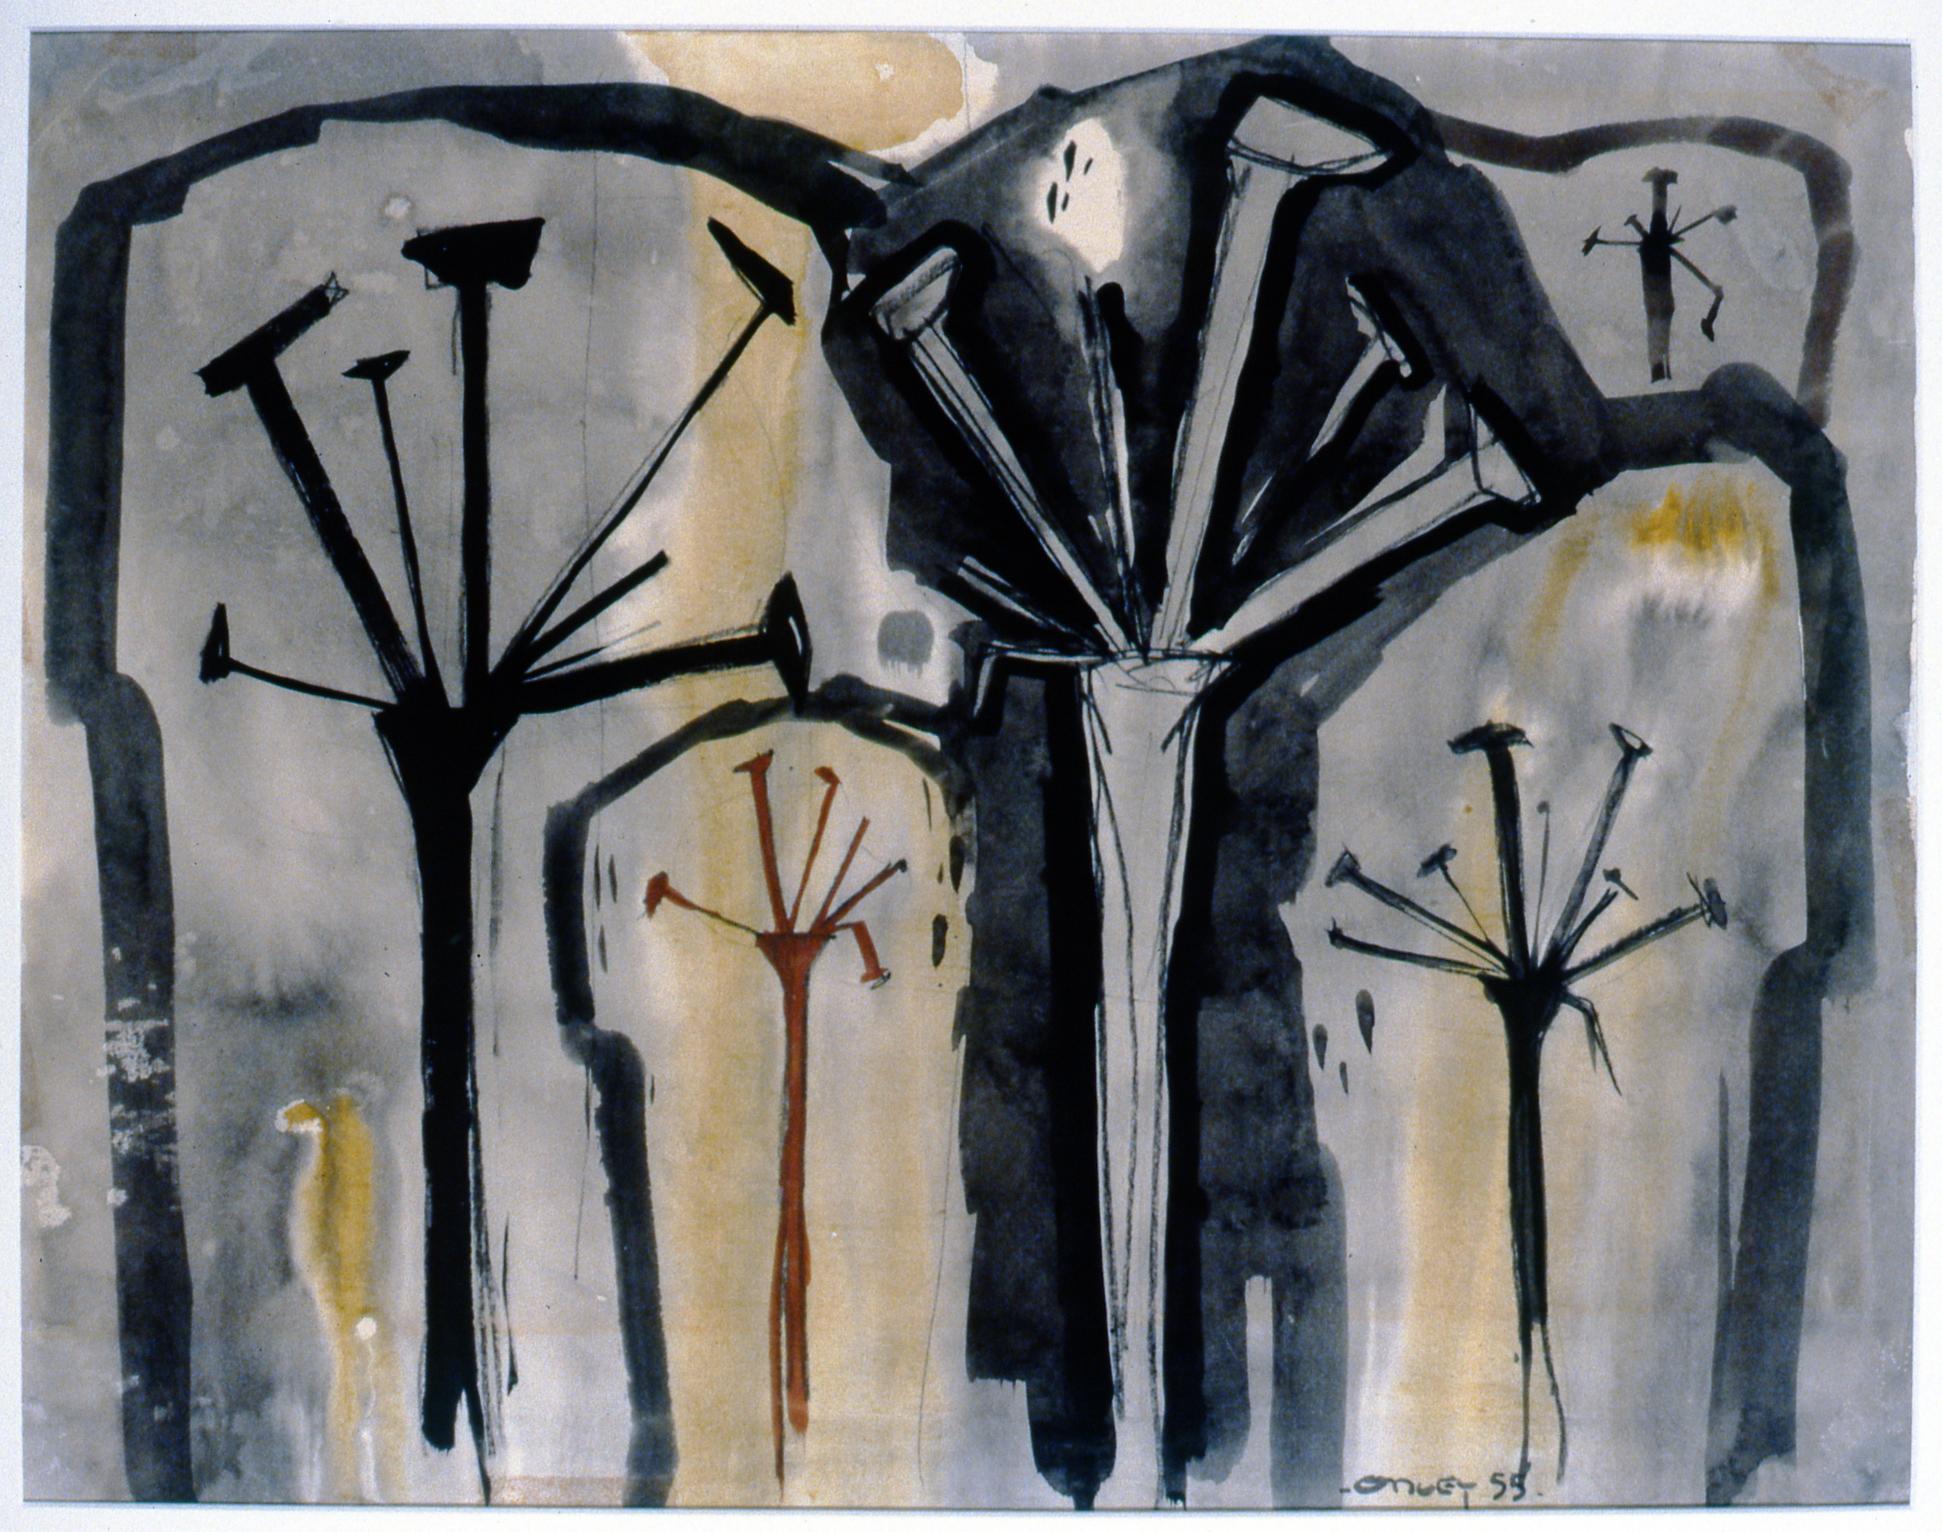 Iris , 1955, Toni Onley, watercolour, 40 cm x 52.7 cm, 2001.04.02. Gift of the Estate of Ethel & Maurice Joslin.